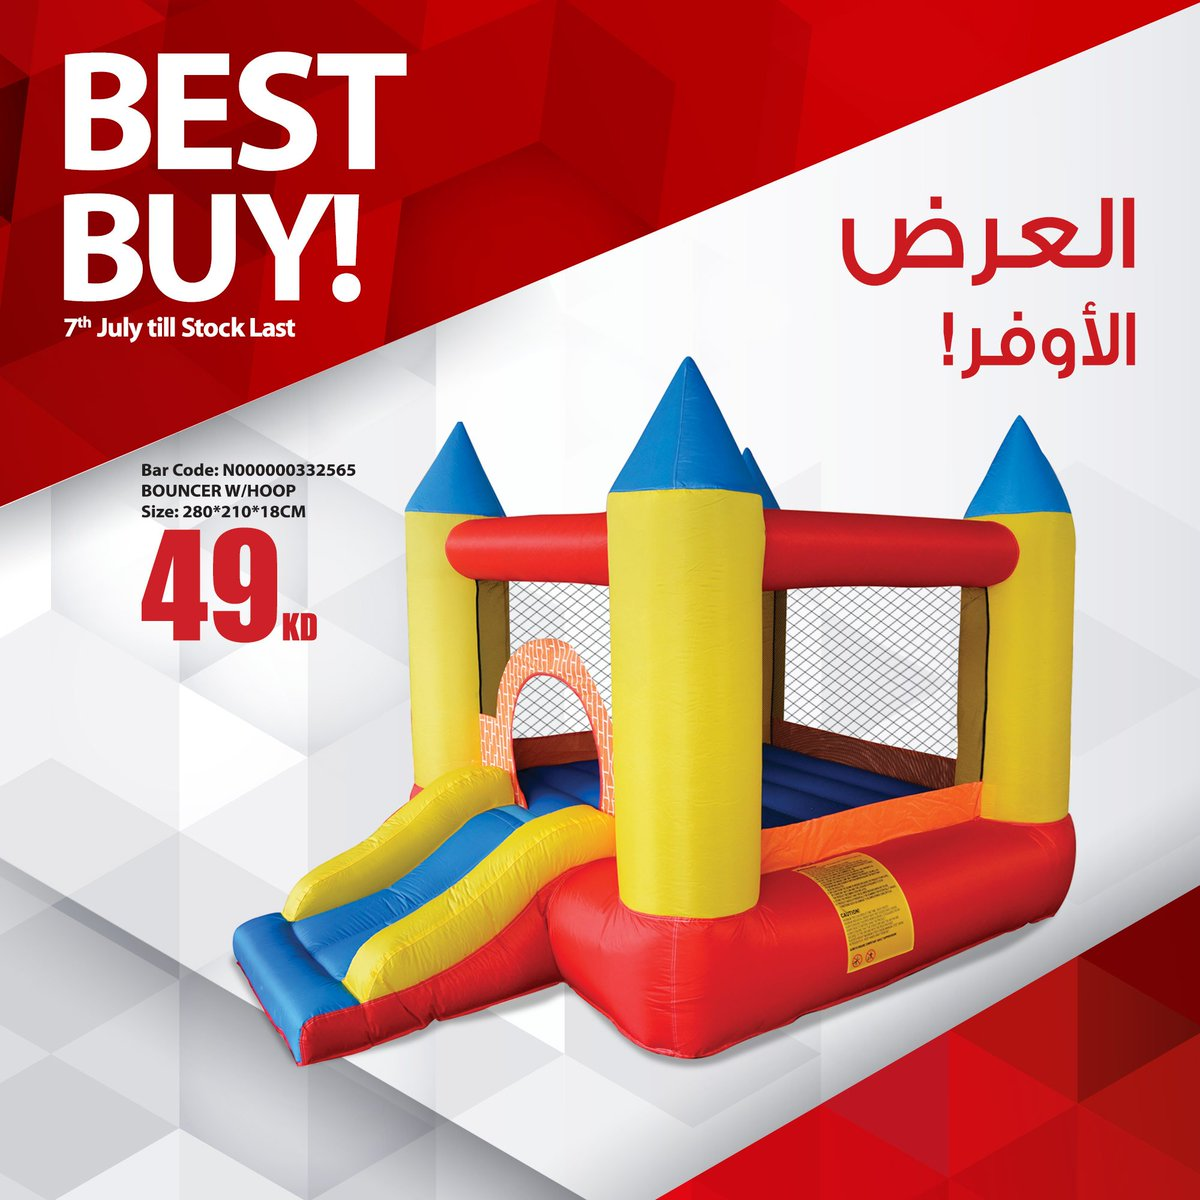 17ed0506b نطاطيه + زحلاقية الآن لدى النصر Best Buy! Bouncer Slide Now at Al Nasser # kuwait #best_buy #slide #play #summer #kids #prices #alnasser #الكويت #تسوق  #العاب ...